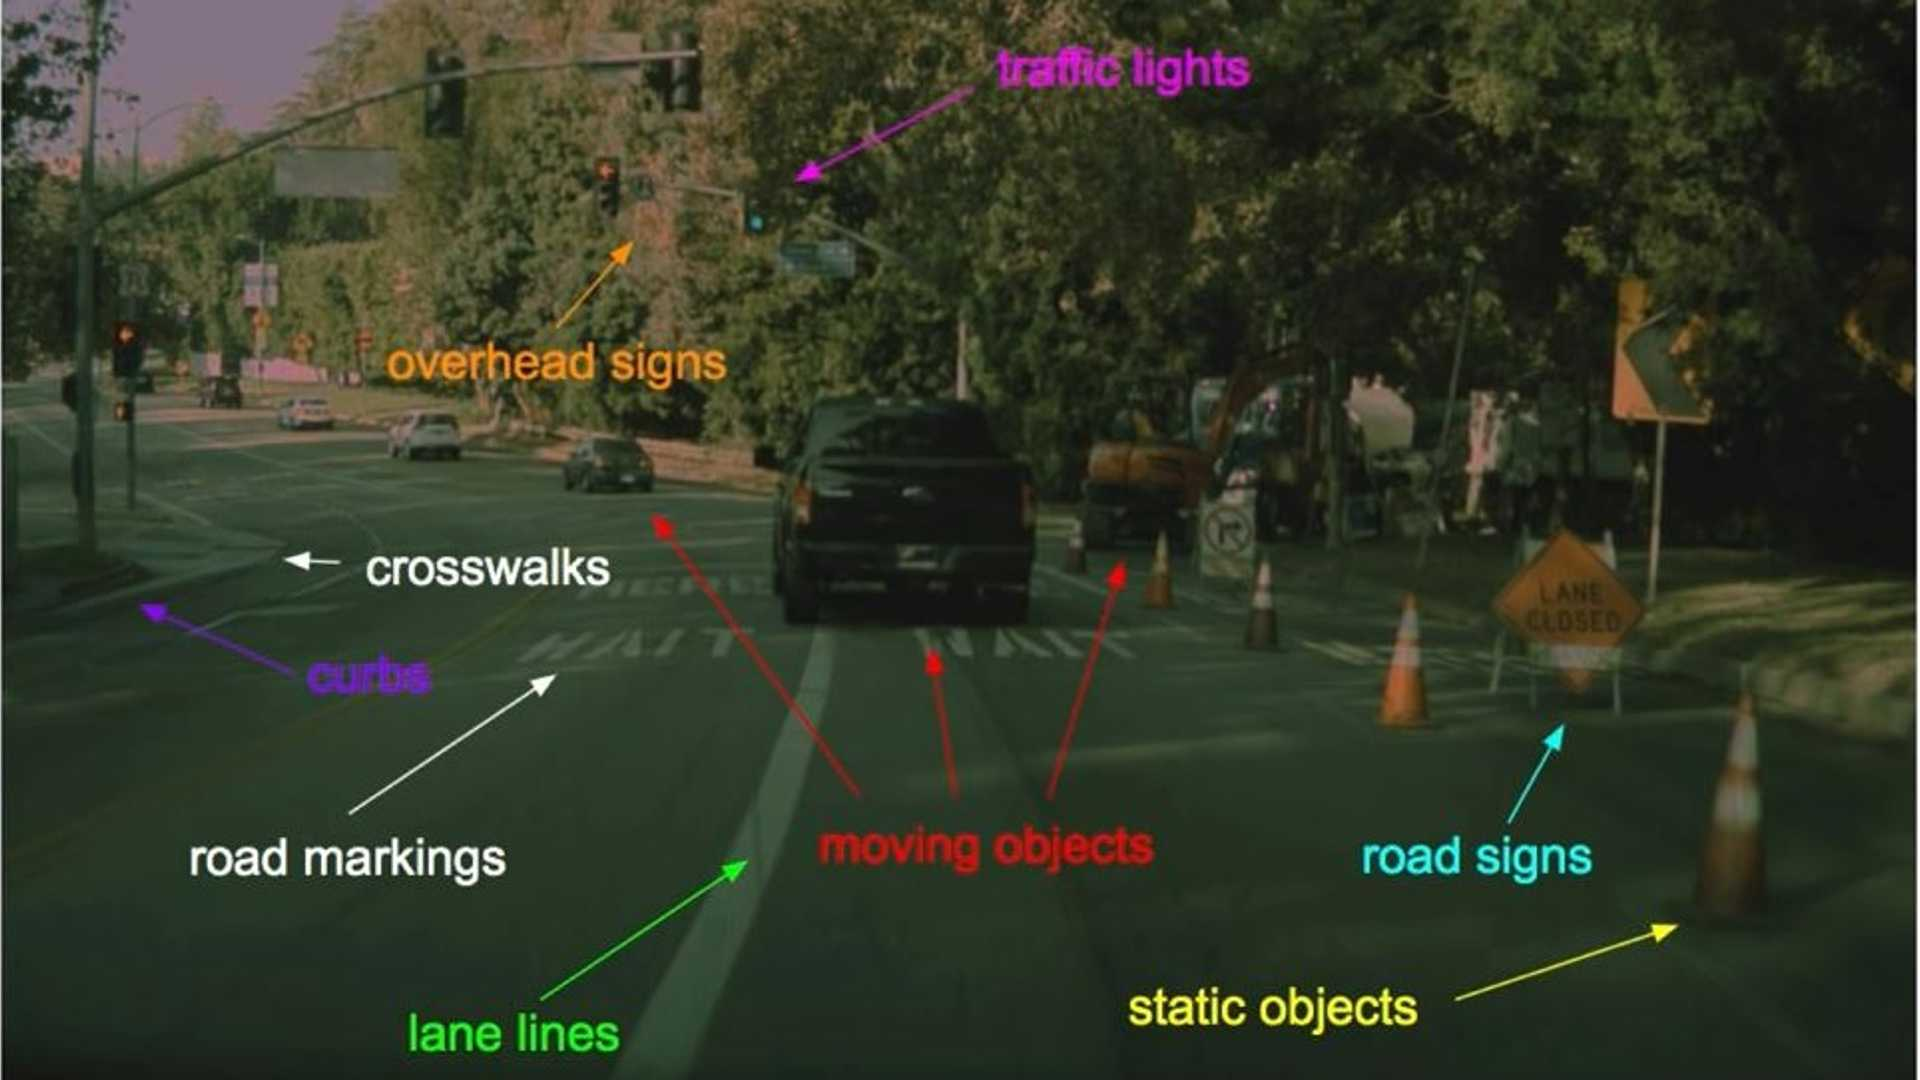 Tesla's Andrej Karpathy Discusses Autopilot, Full Self-Driving, PyTorch